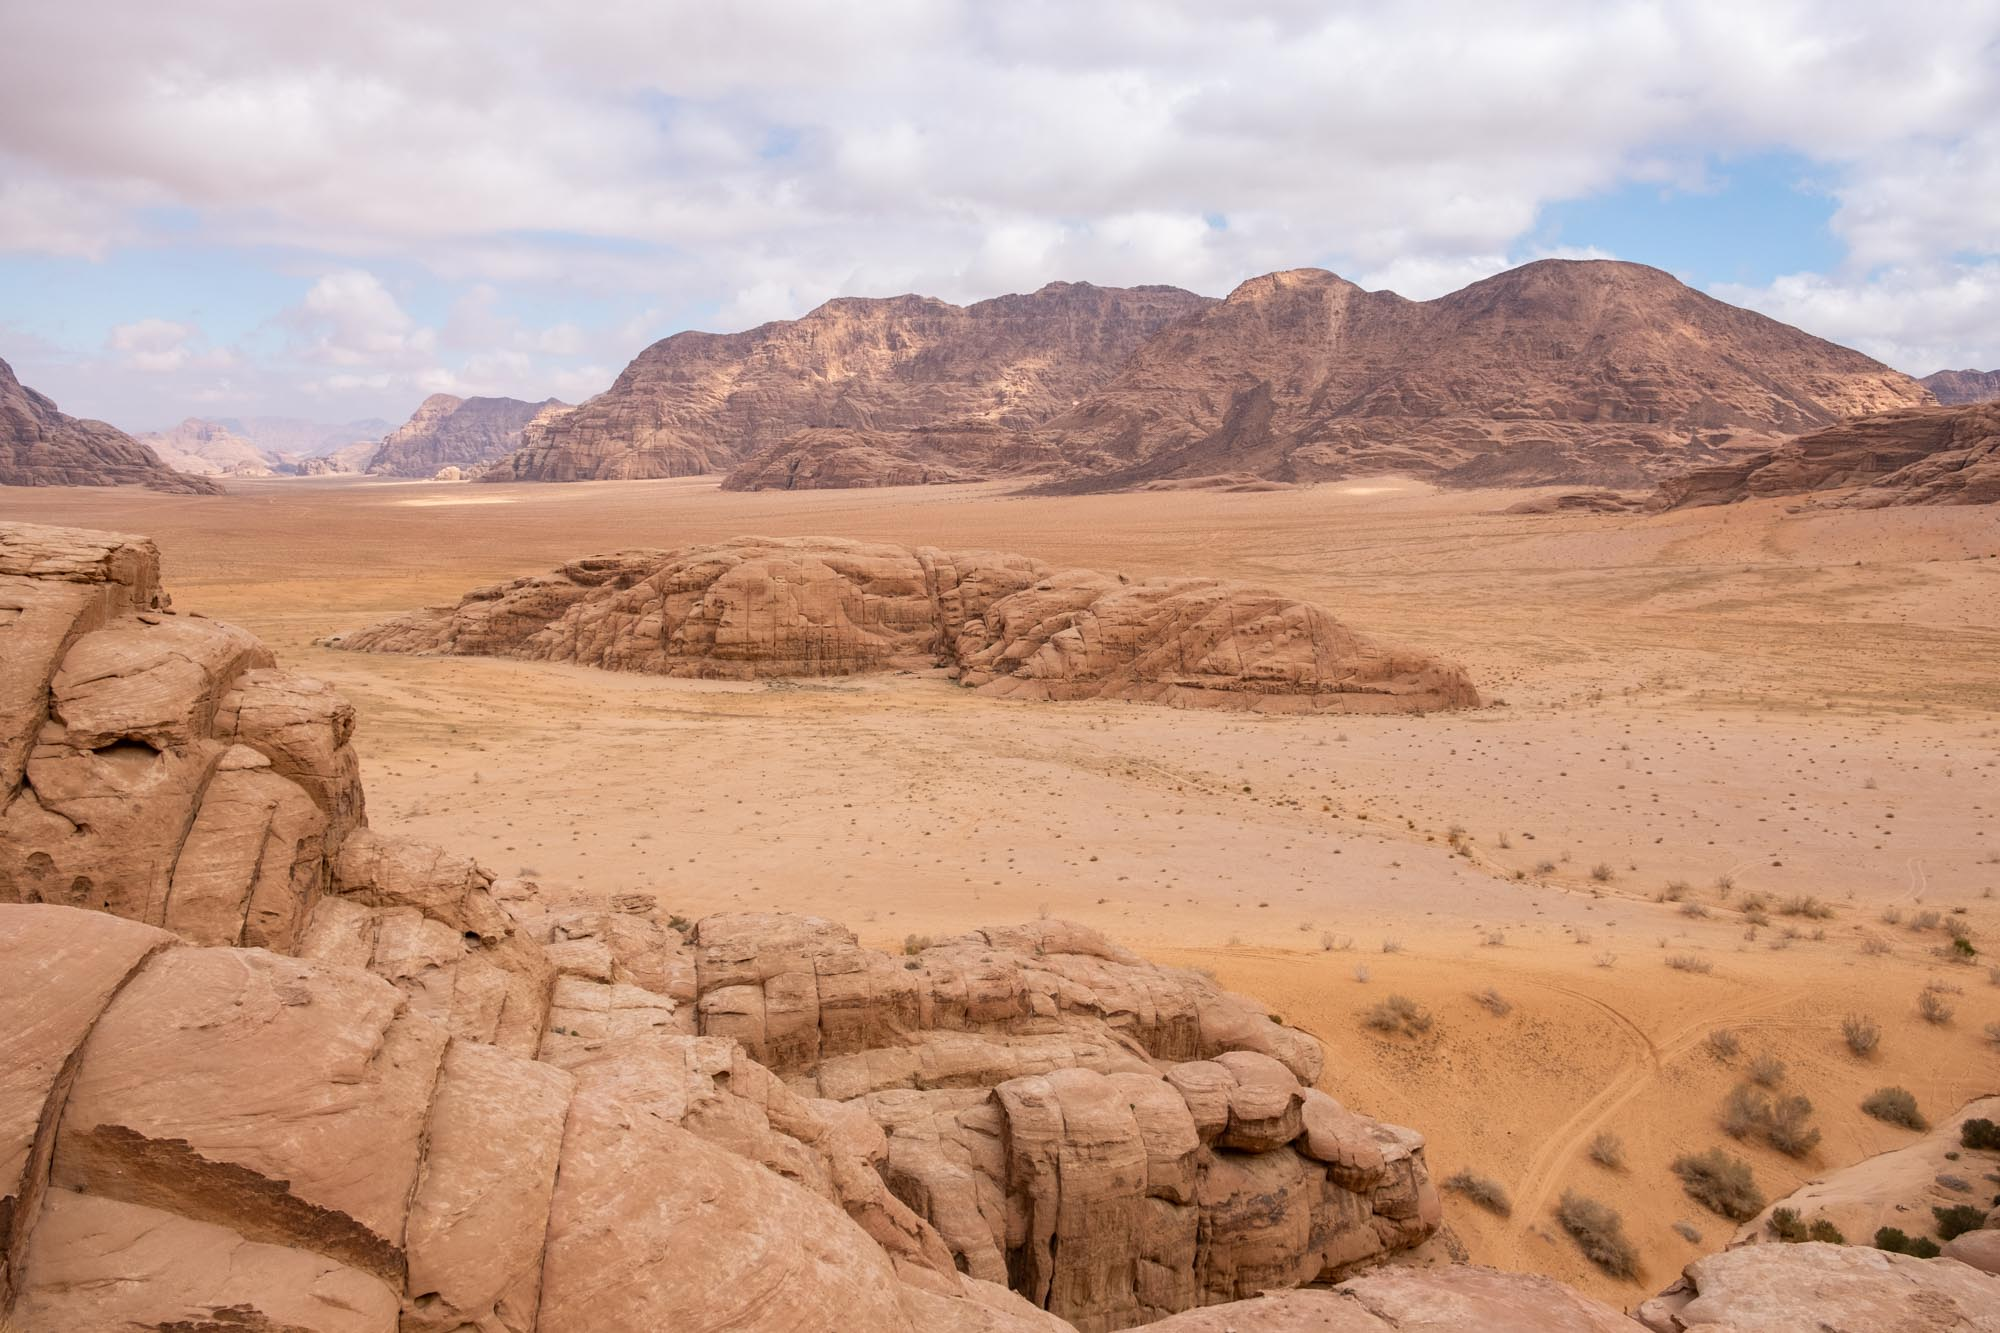 Jabal Burdah